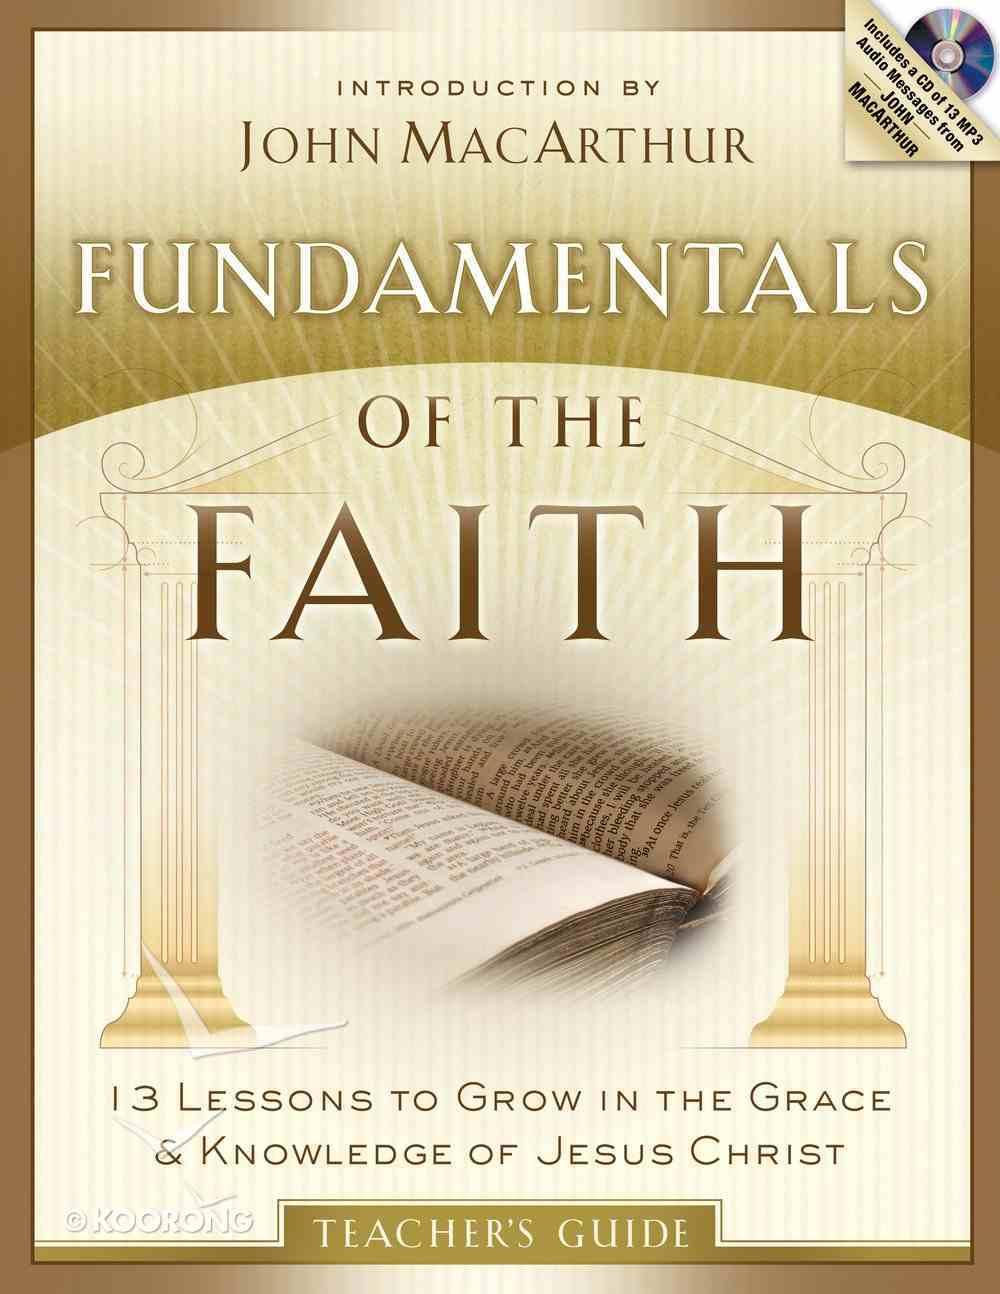 Fundamentals of the Faith (Teacher's Guide With Mp3) eBook